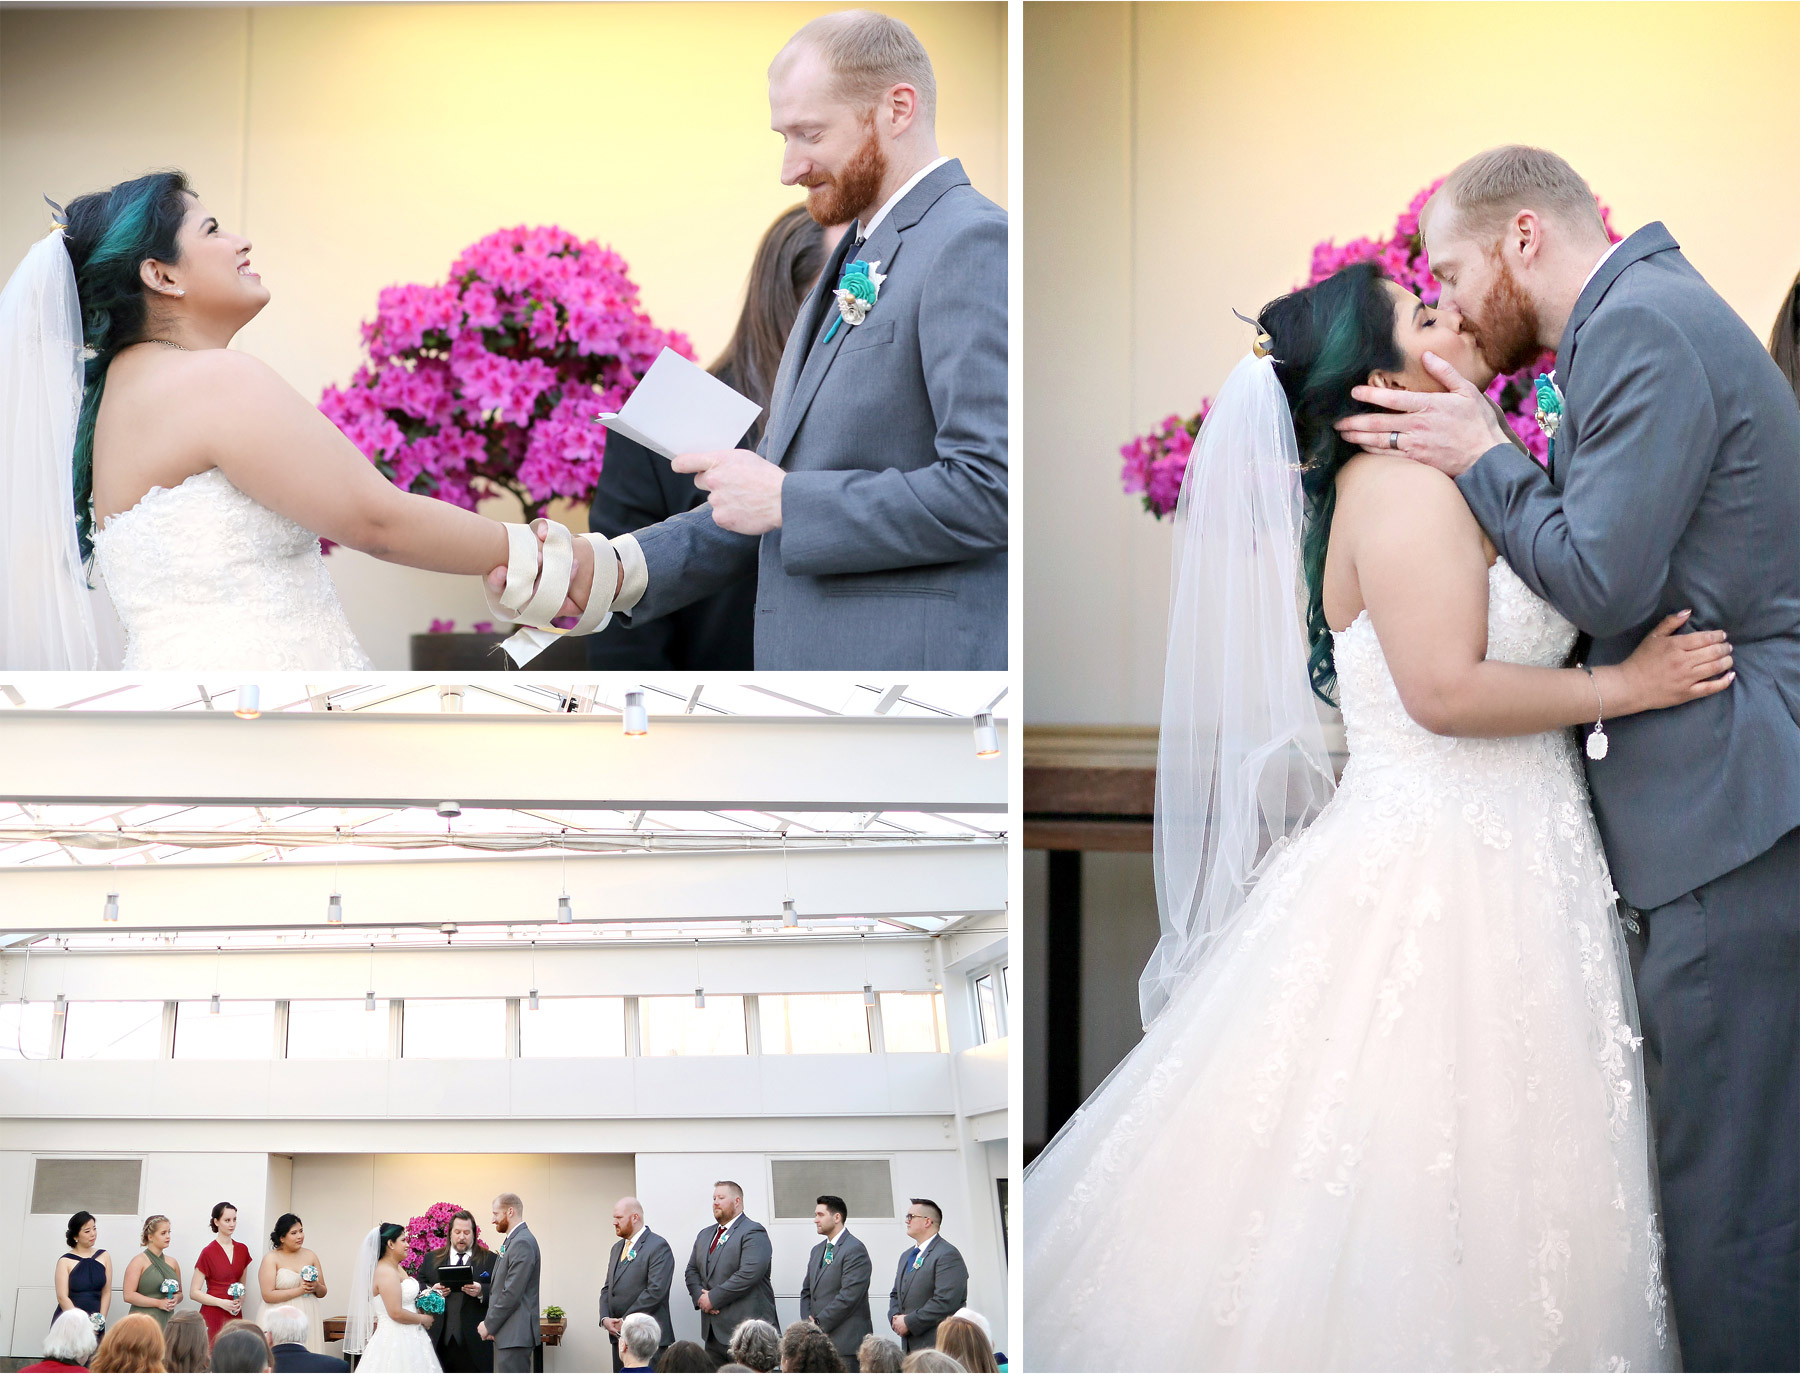 11-Saint-Paul-Minnesota-Wedding-Photography-by-Vick-Photography-Como-Park-Conservatory-Ceremony-Elena-and-Doug.jpg